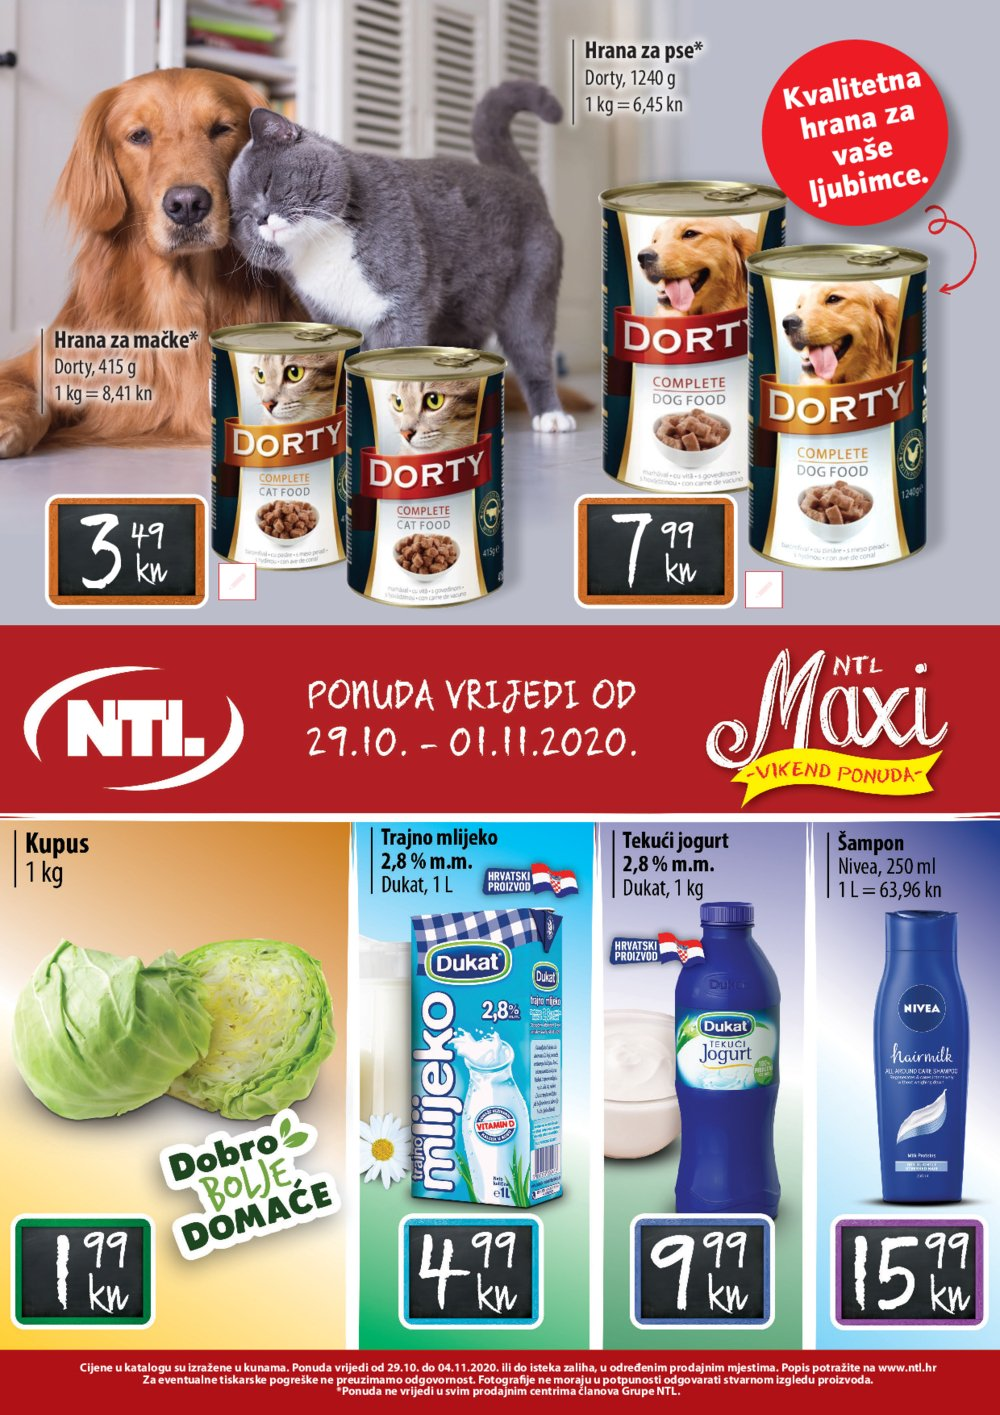 Studenac katalog NTL Maxi Tjedna ponuda 29.10.-04.11.2020.